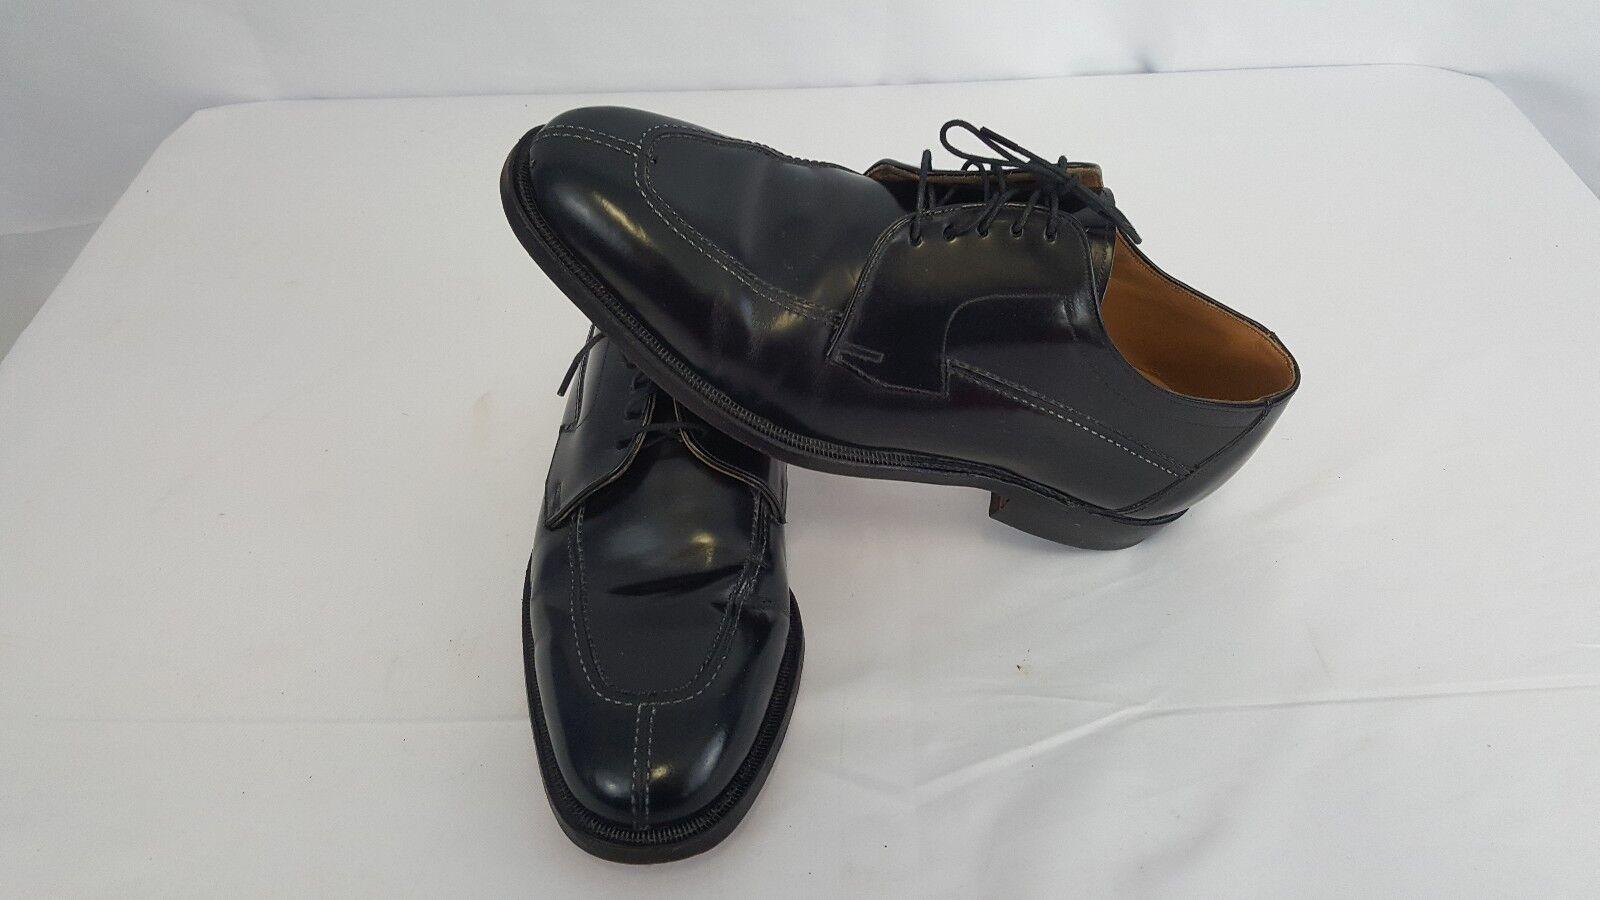 Johnston & Murphy Limited black split toe oxfords Men's dress formal shoes 10D B